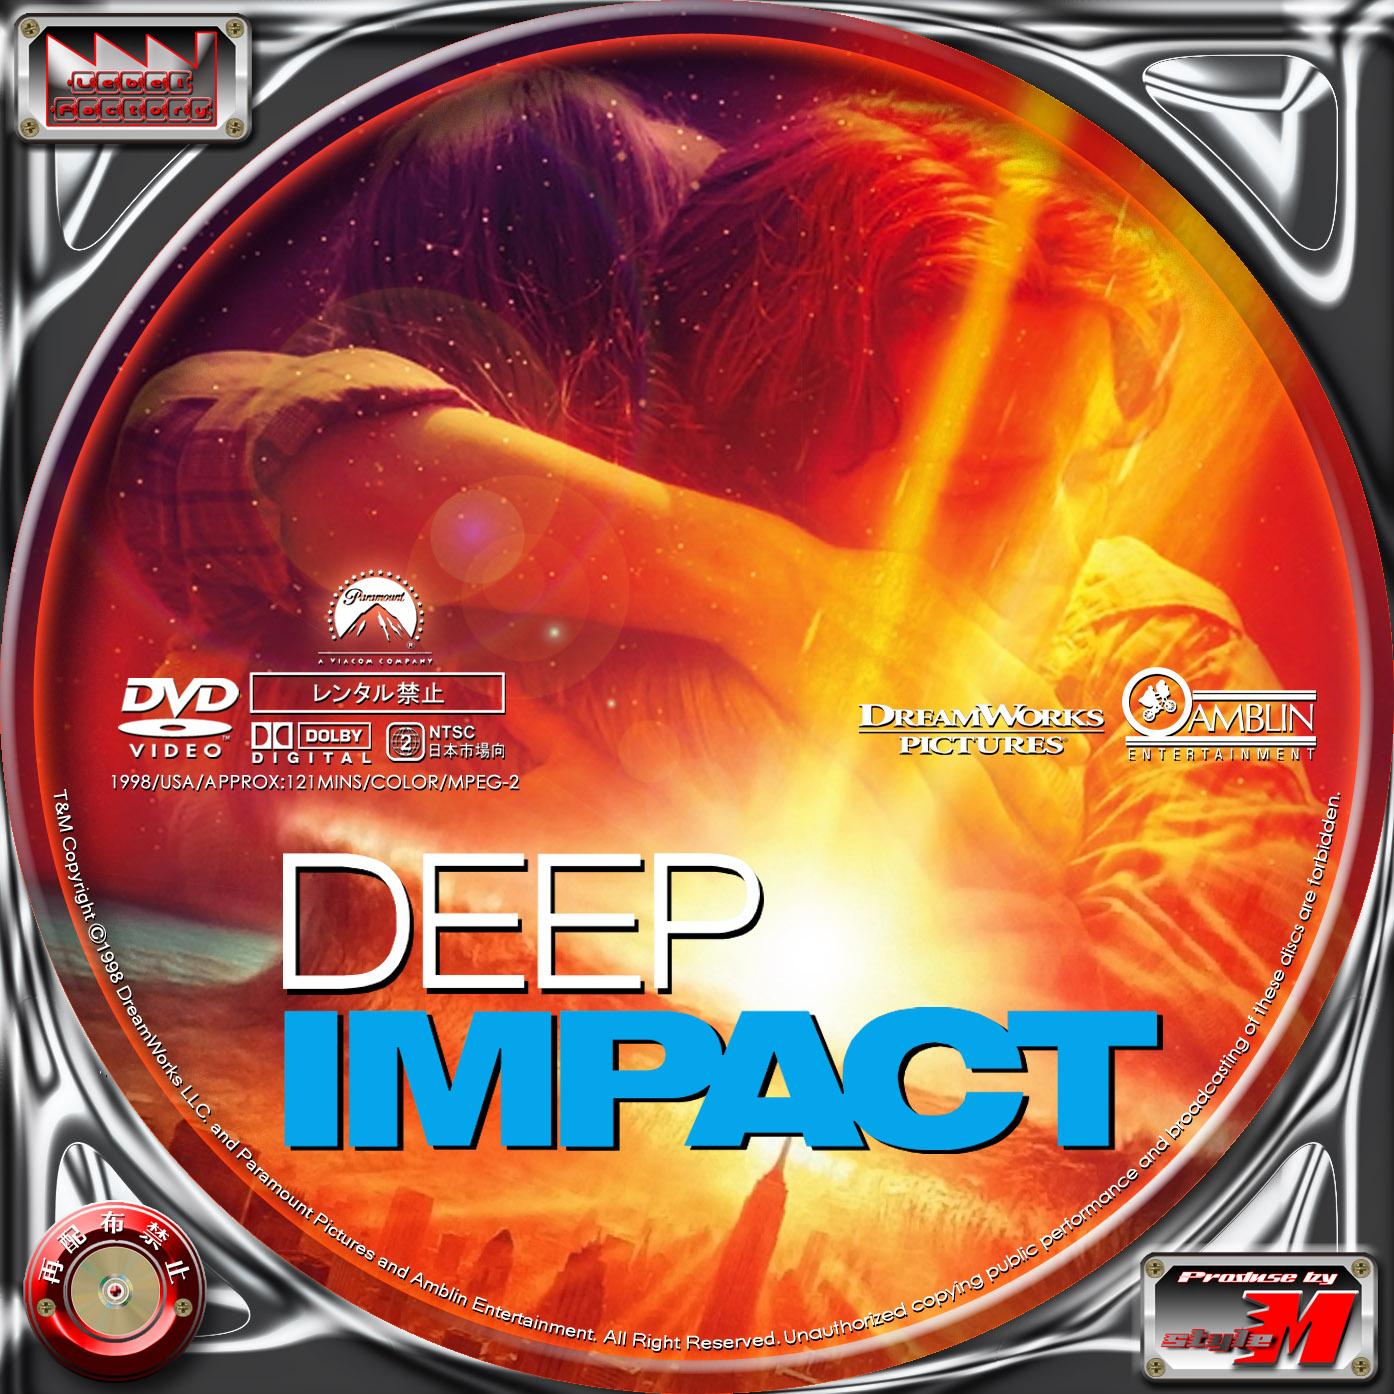 999x555 151kb Jpeg: ディープ・インパクト2016